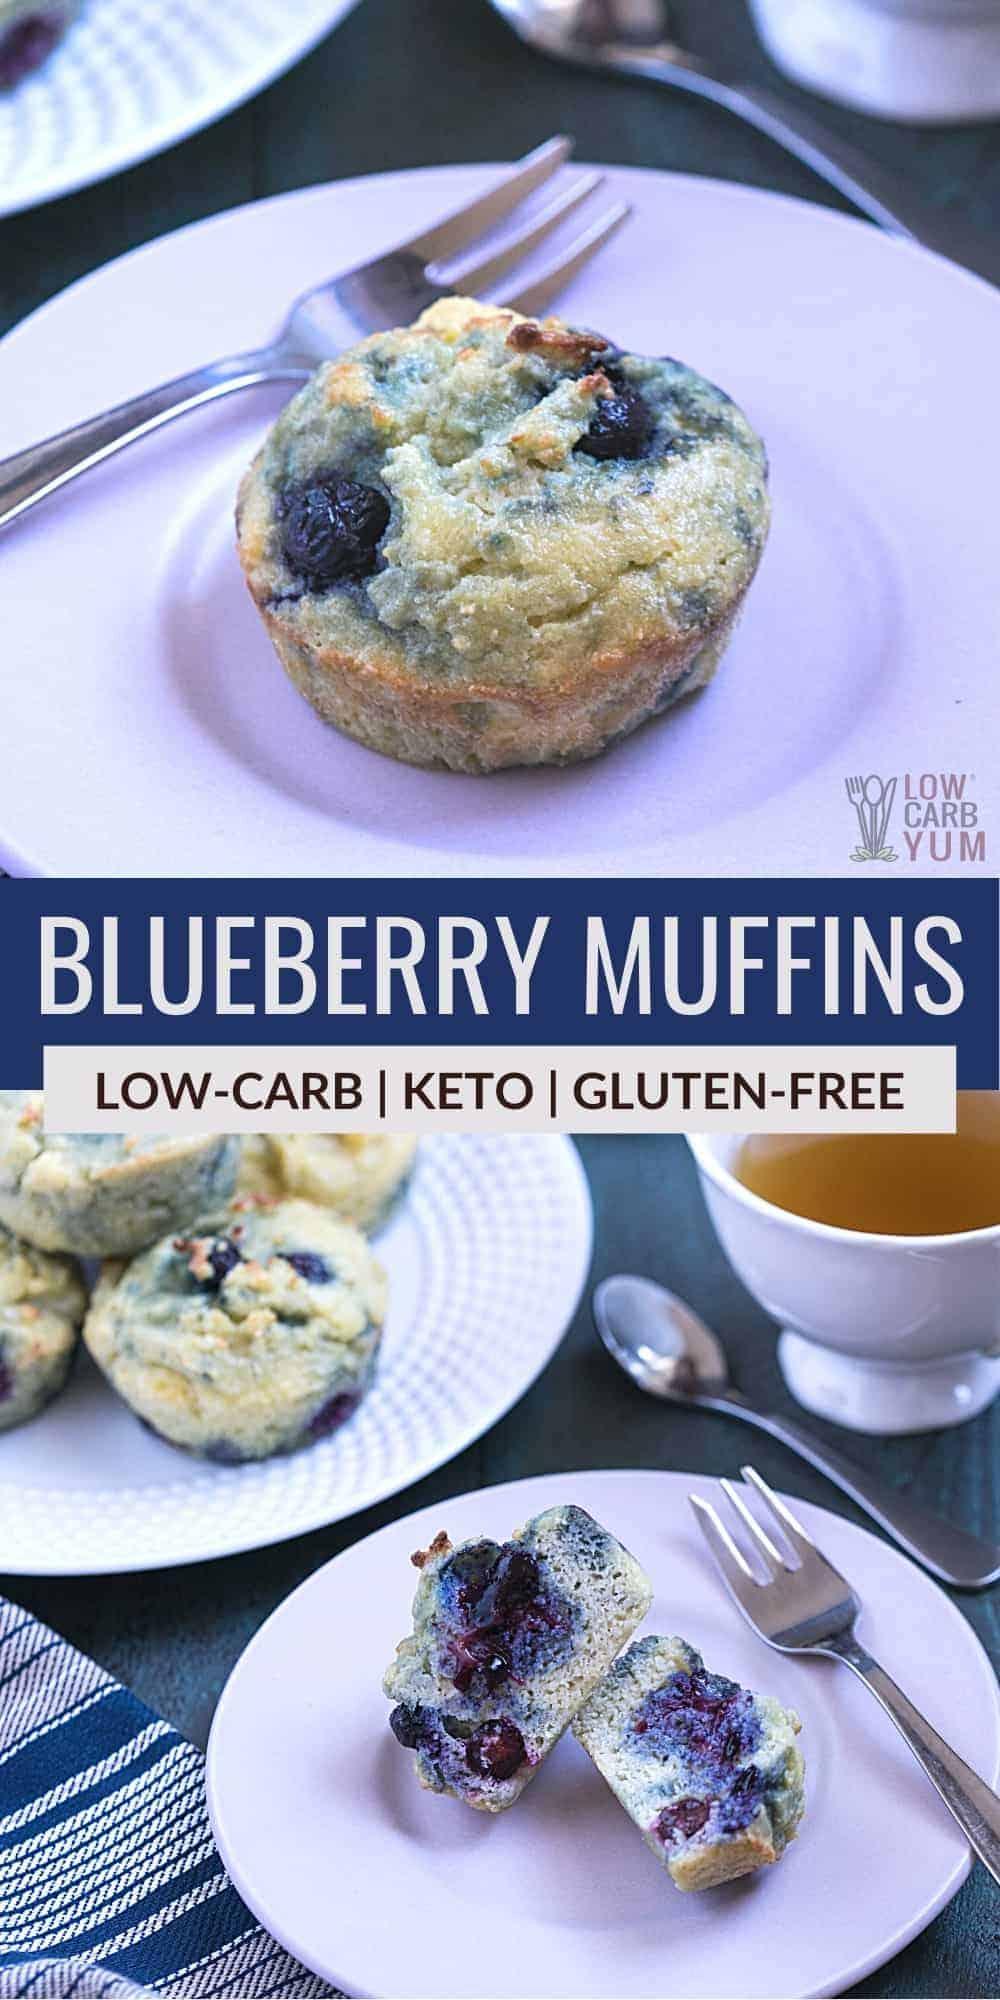 keto blueberry muffins pinterest image